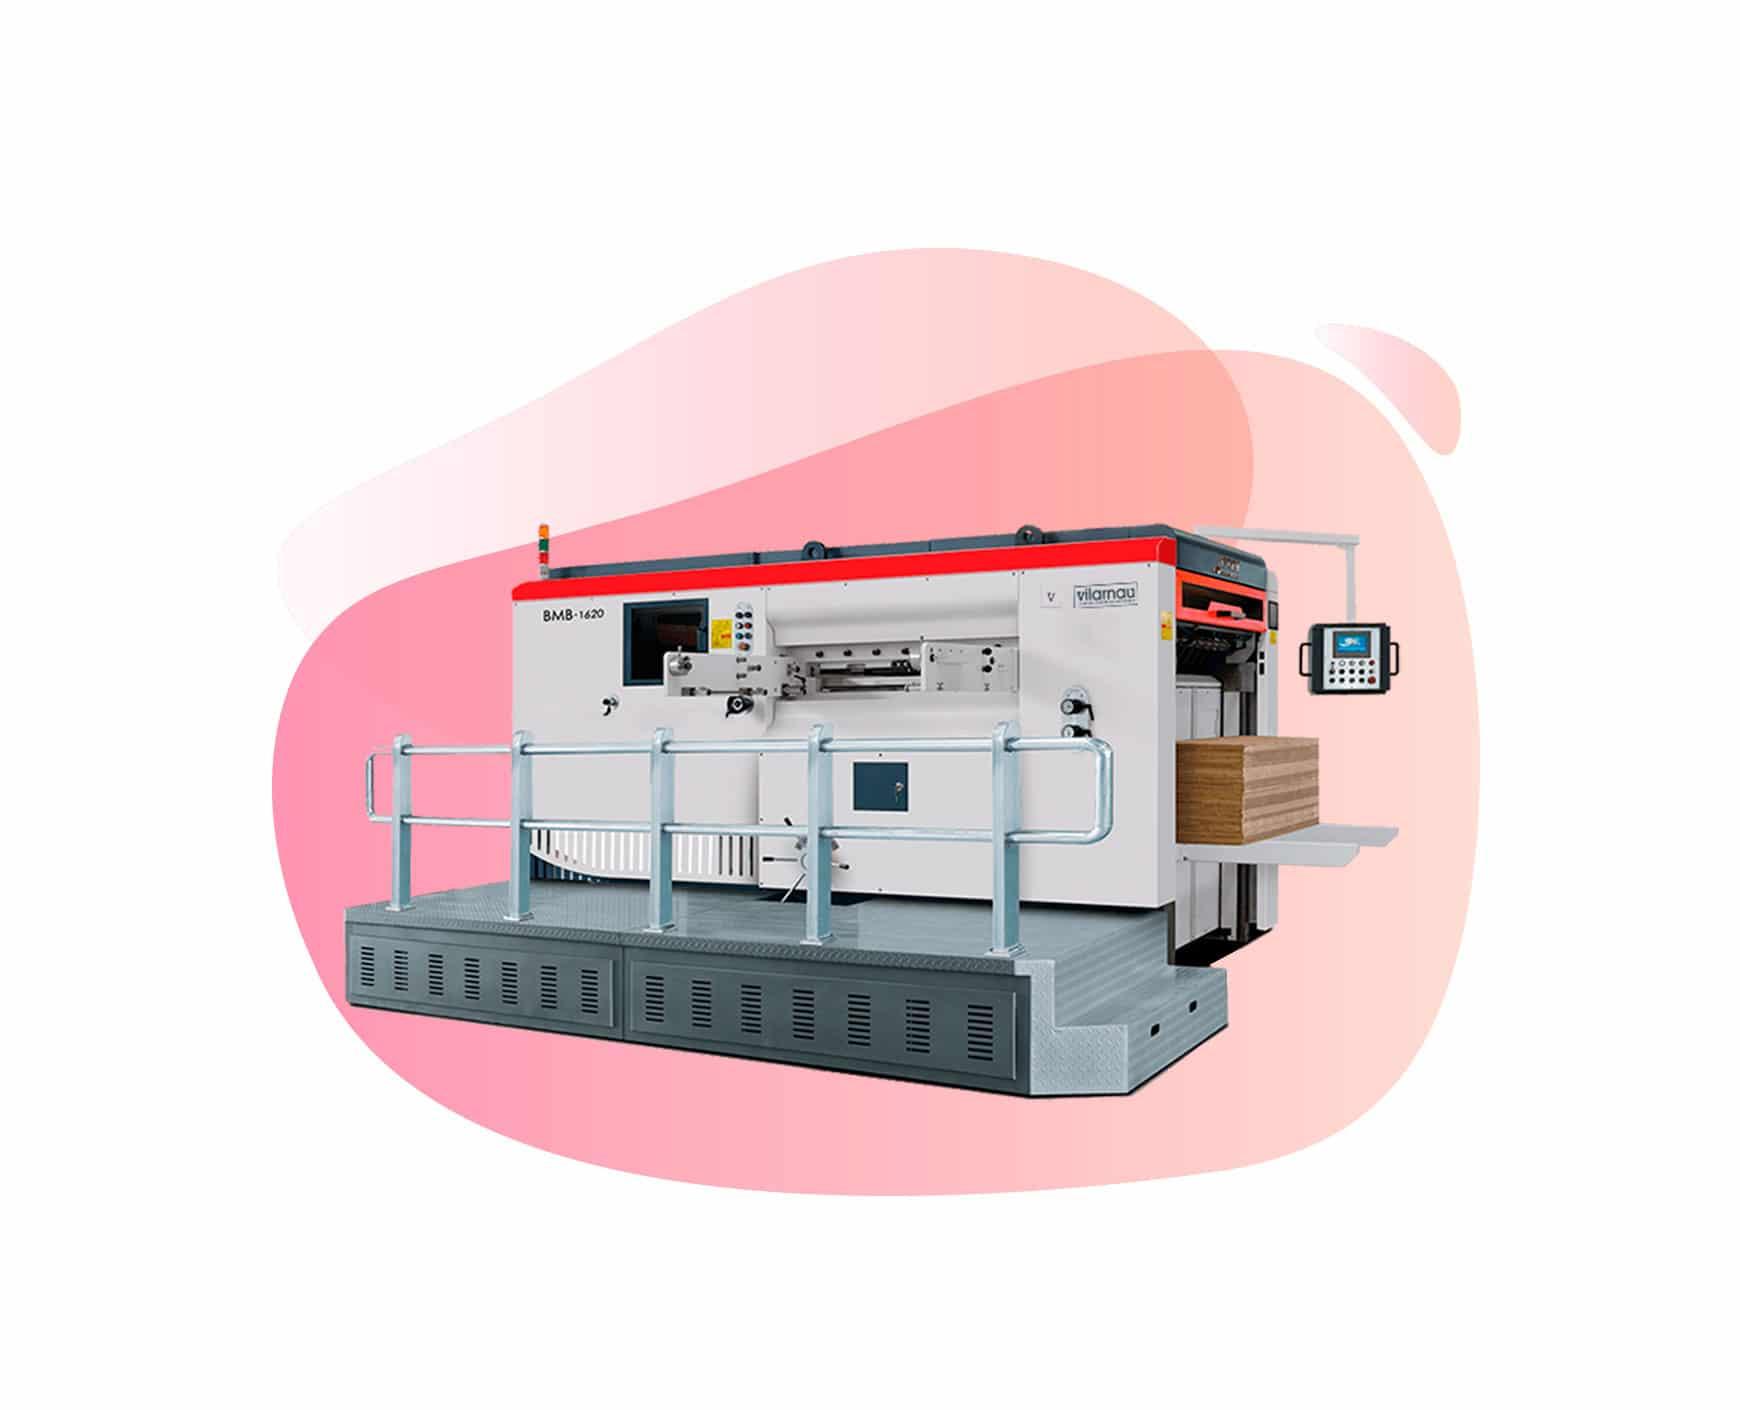 BMB ECO – Troqueladora Semi-automática